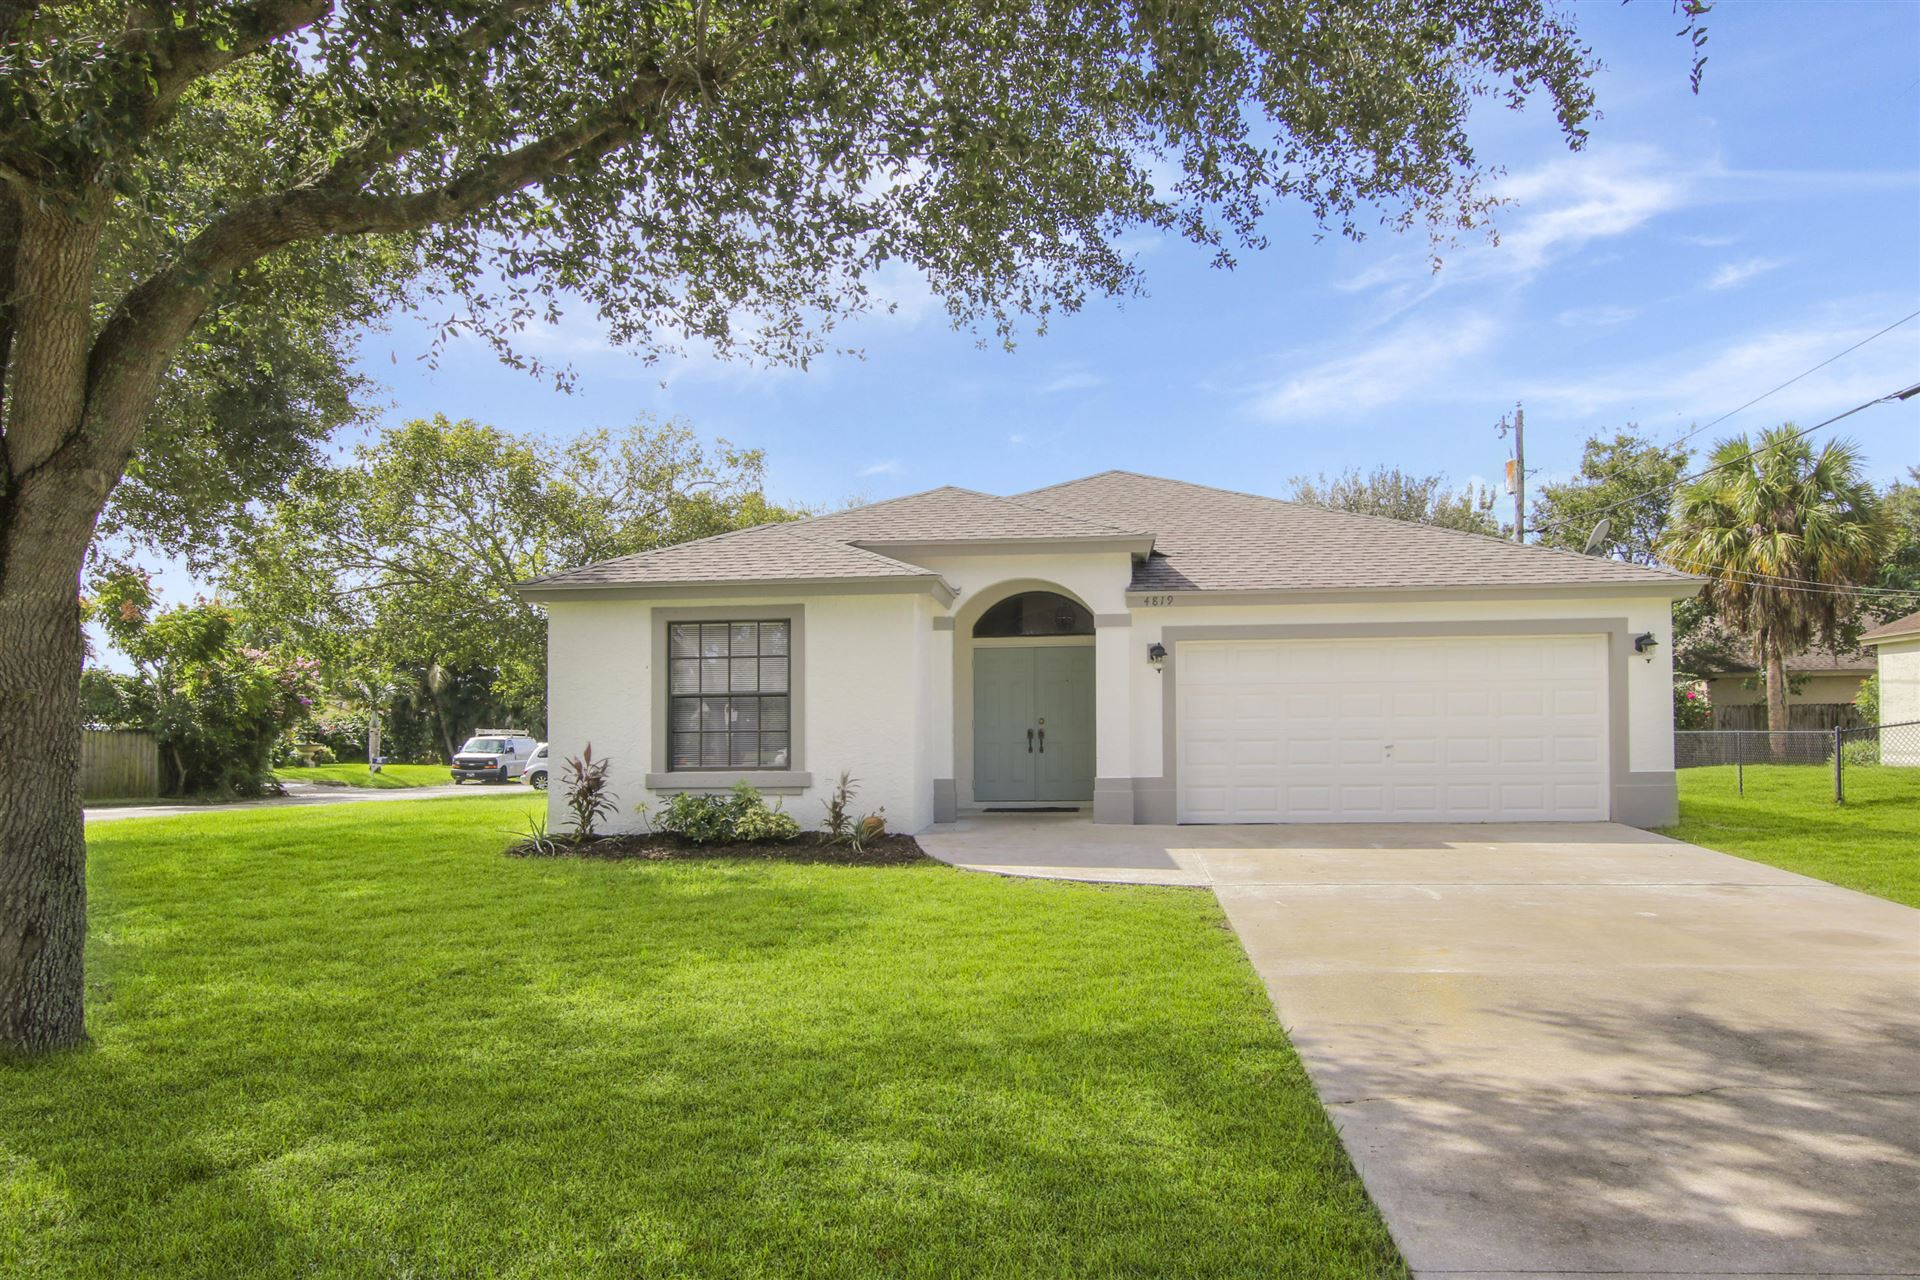 4819 Bonanza Road, Lake Worth, FL 33467 - #: RX-10659366